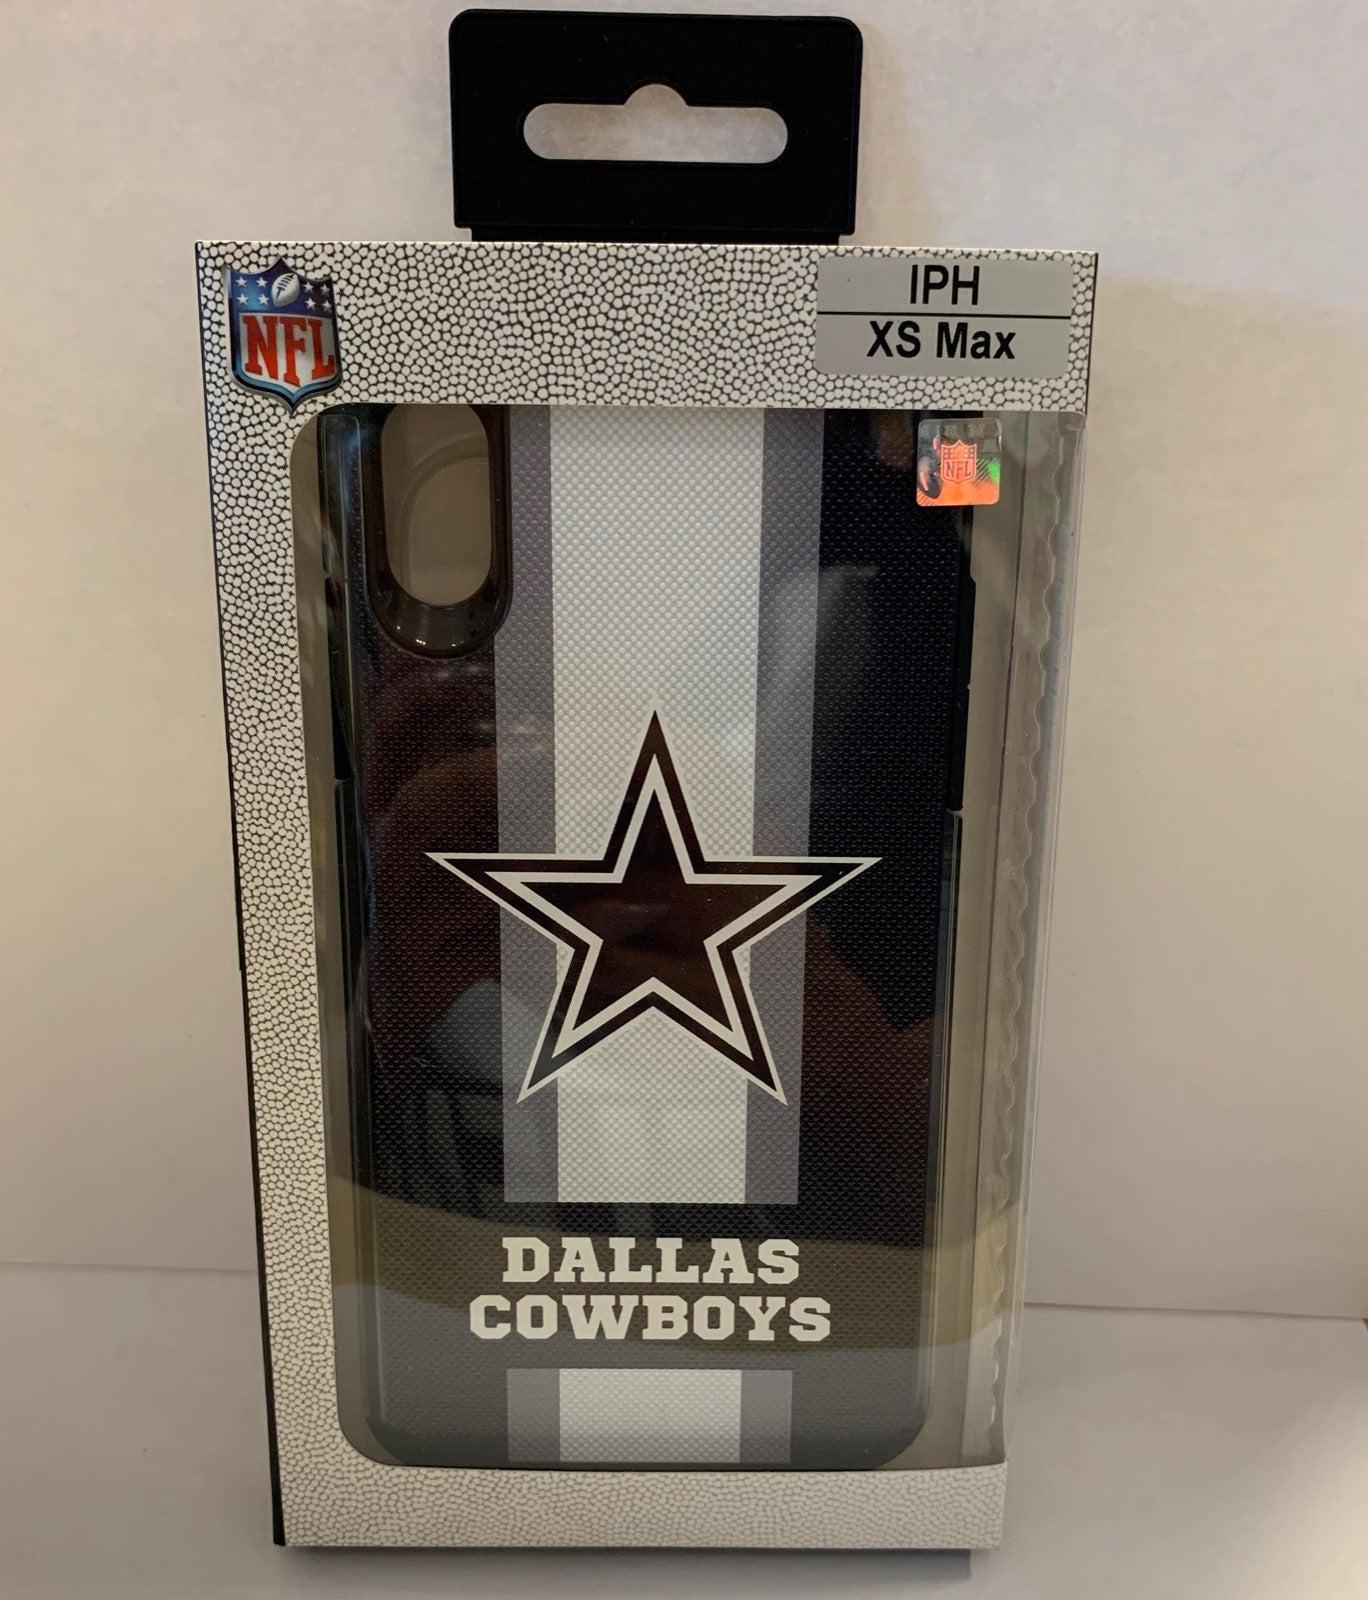 NFL Dallas Cowboys iPhone XS Max Case